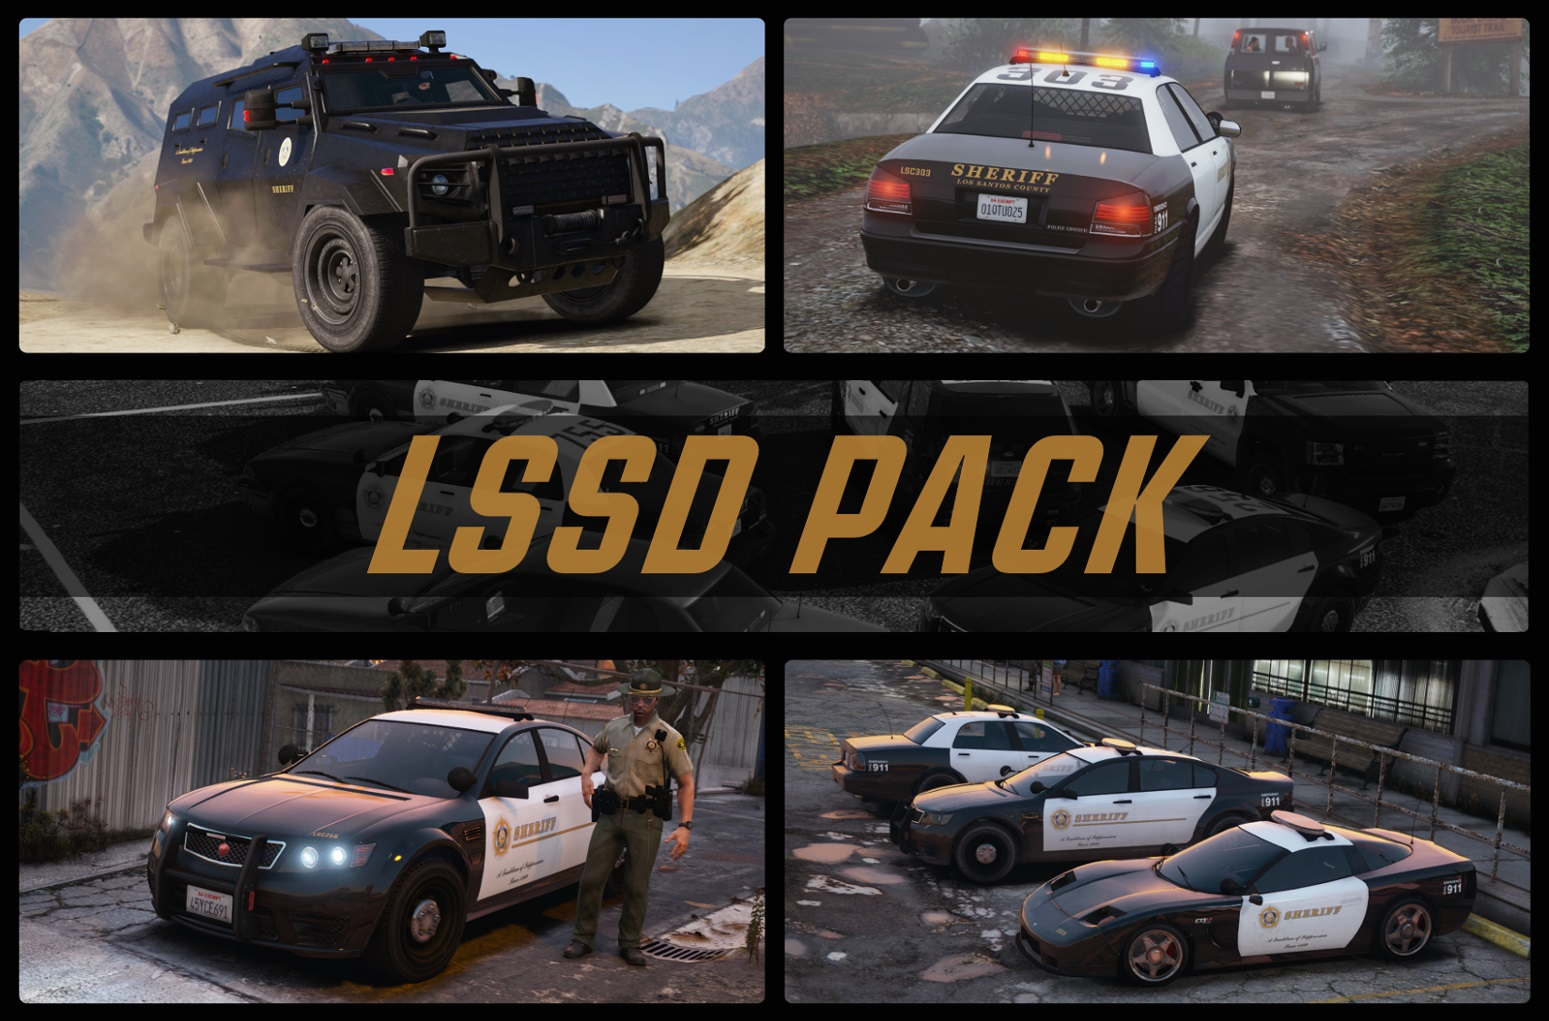 LSSD Pack 1.0b